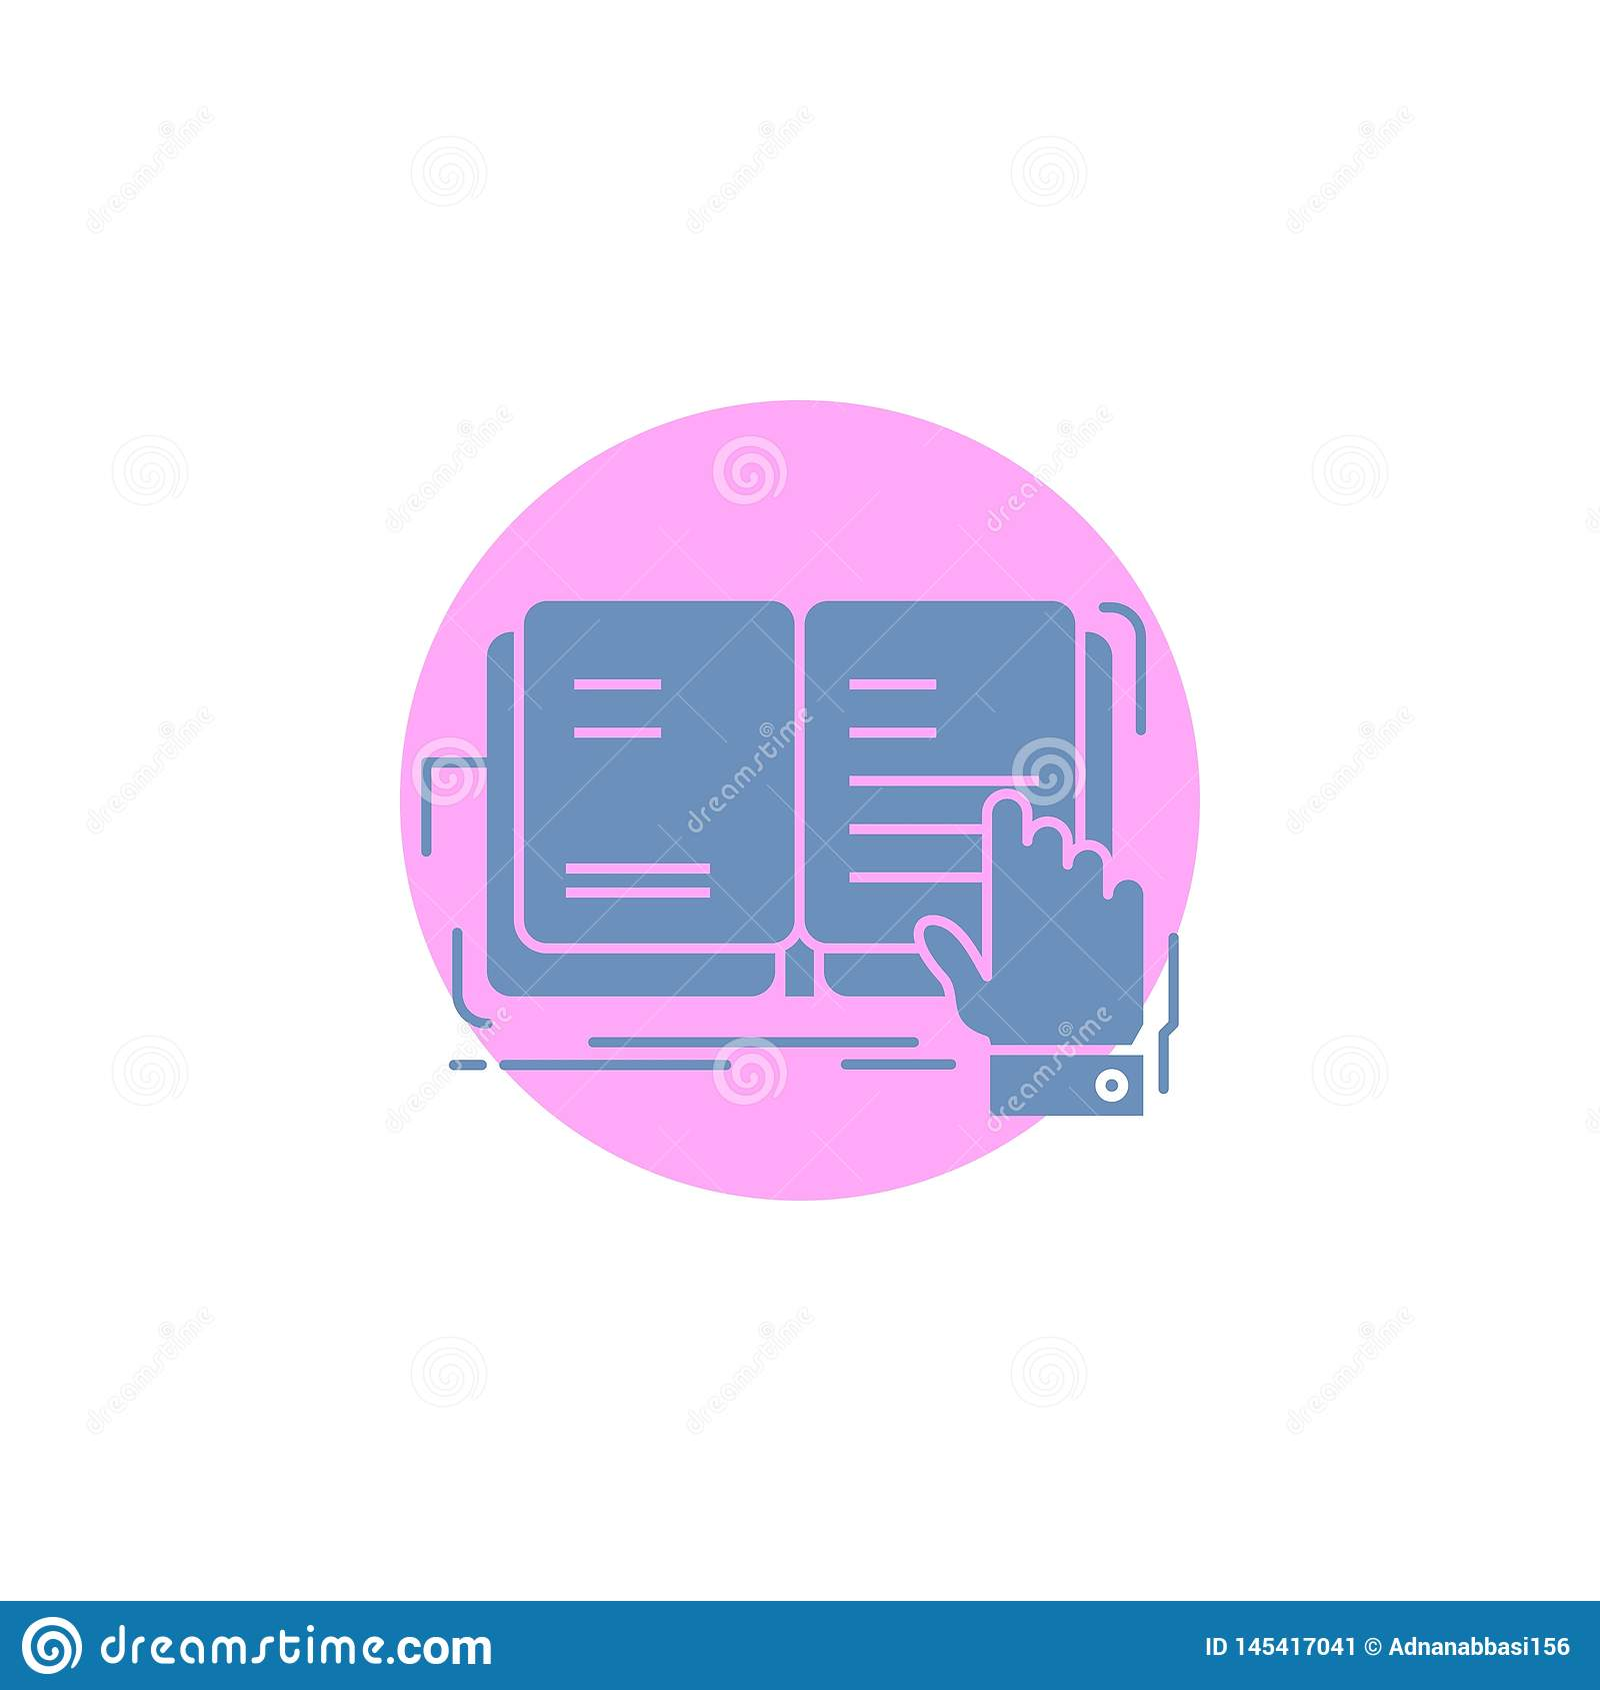 Książka, lekcja, nauka, literatura, czytelnicza glif ikona